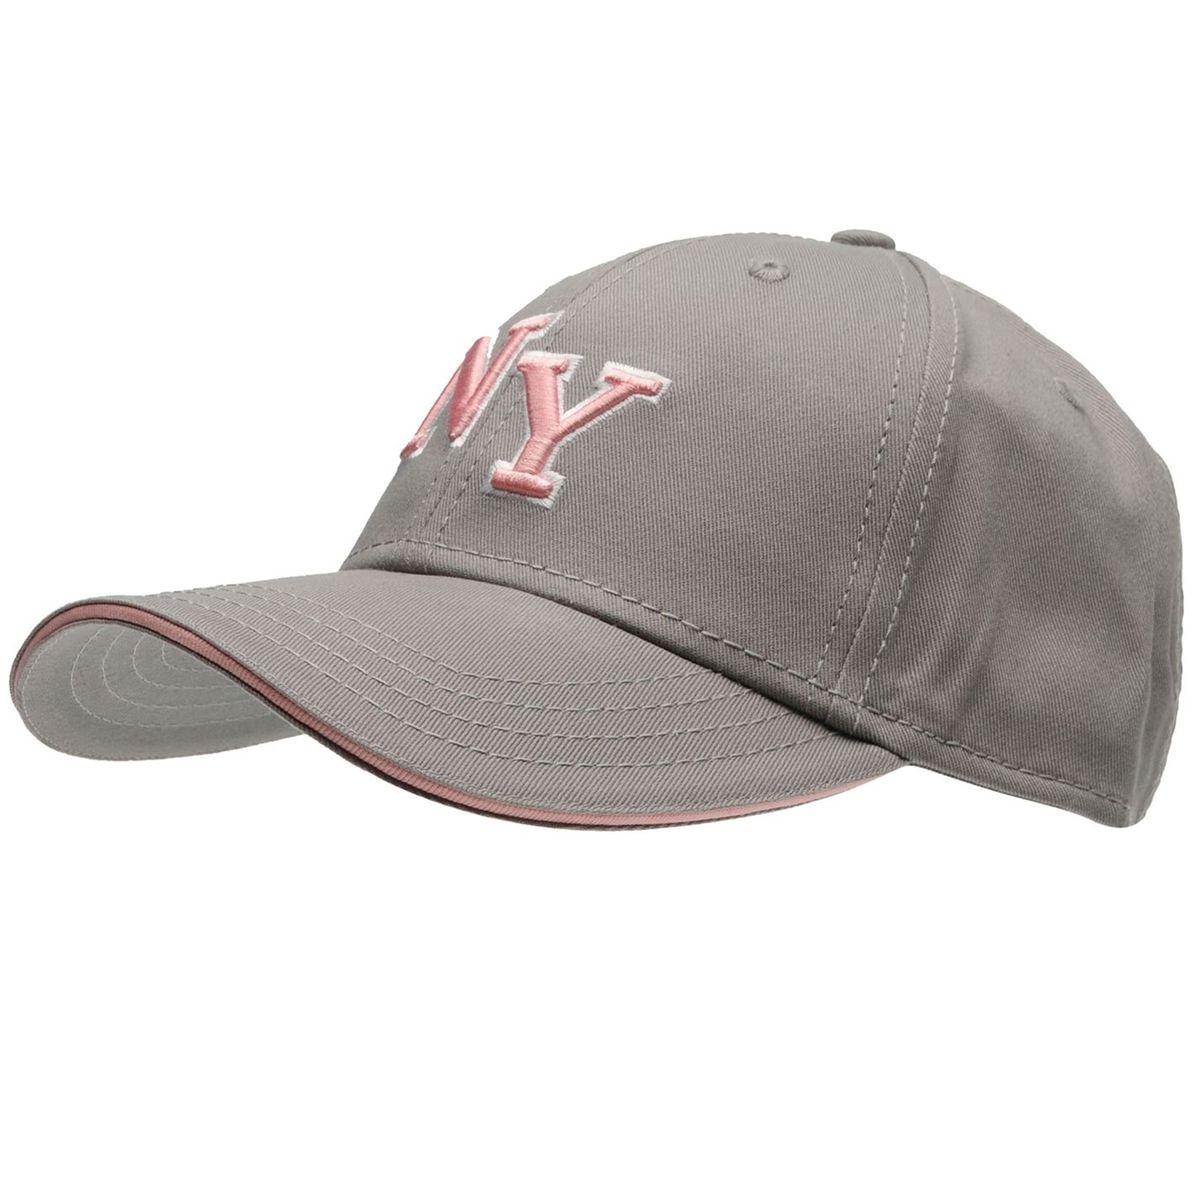 Ny casquette visière plate